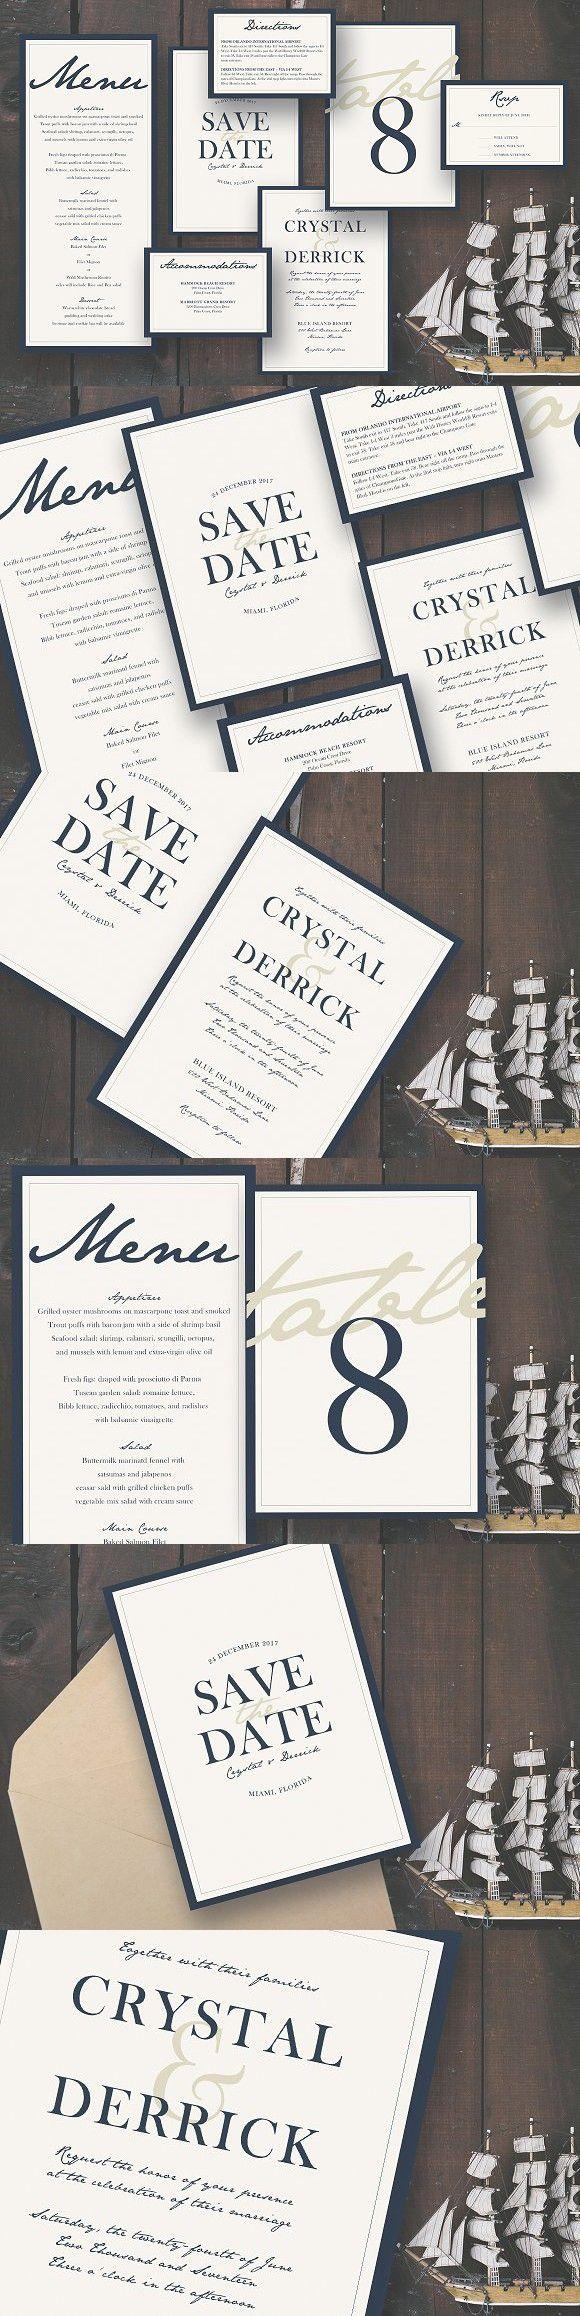 Deep Blue Sea Wedding Suite Wedding Invitation